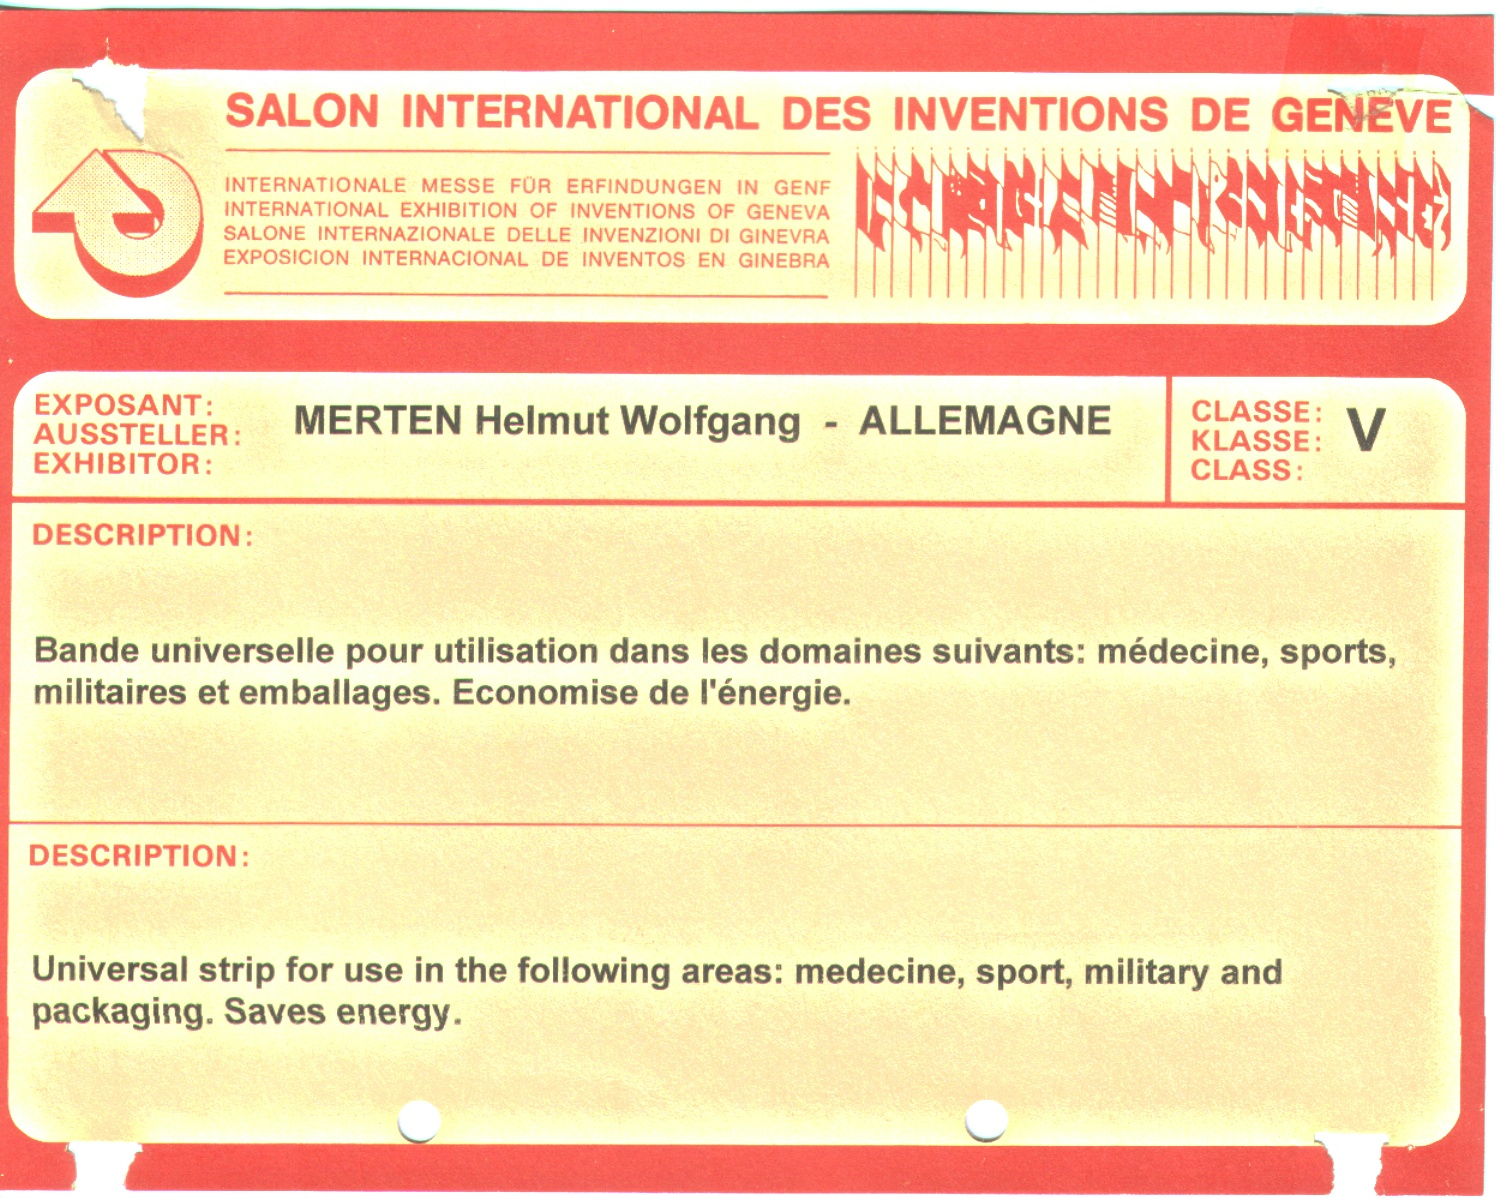 Mersystem universalband - Salon des inventions ...